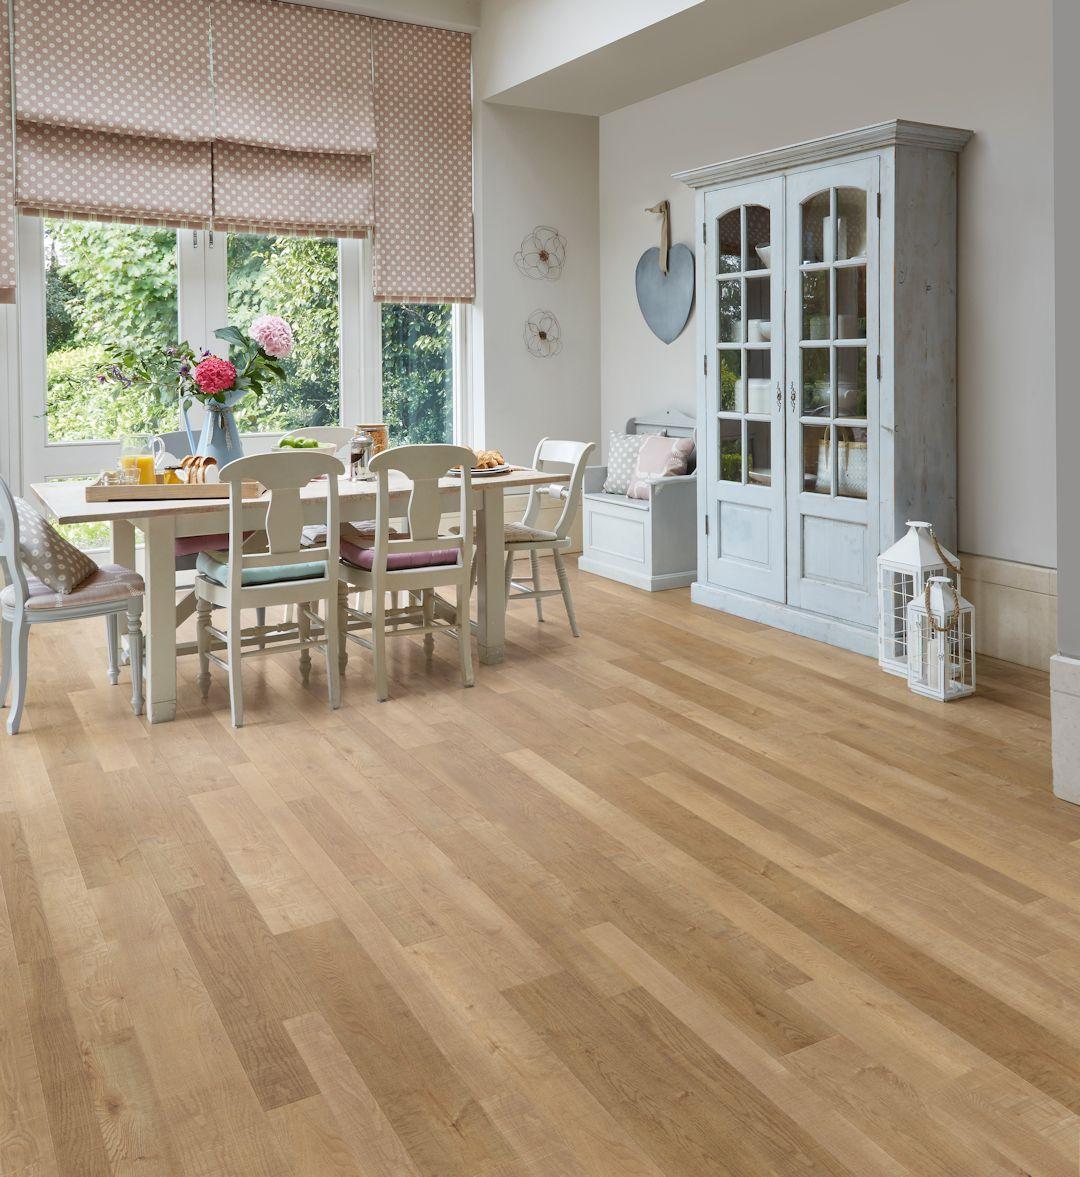 Dining Room Flooring Salvaged Timber Camaro Luxury Vinyl Tiles Featured In Dining Room